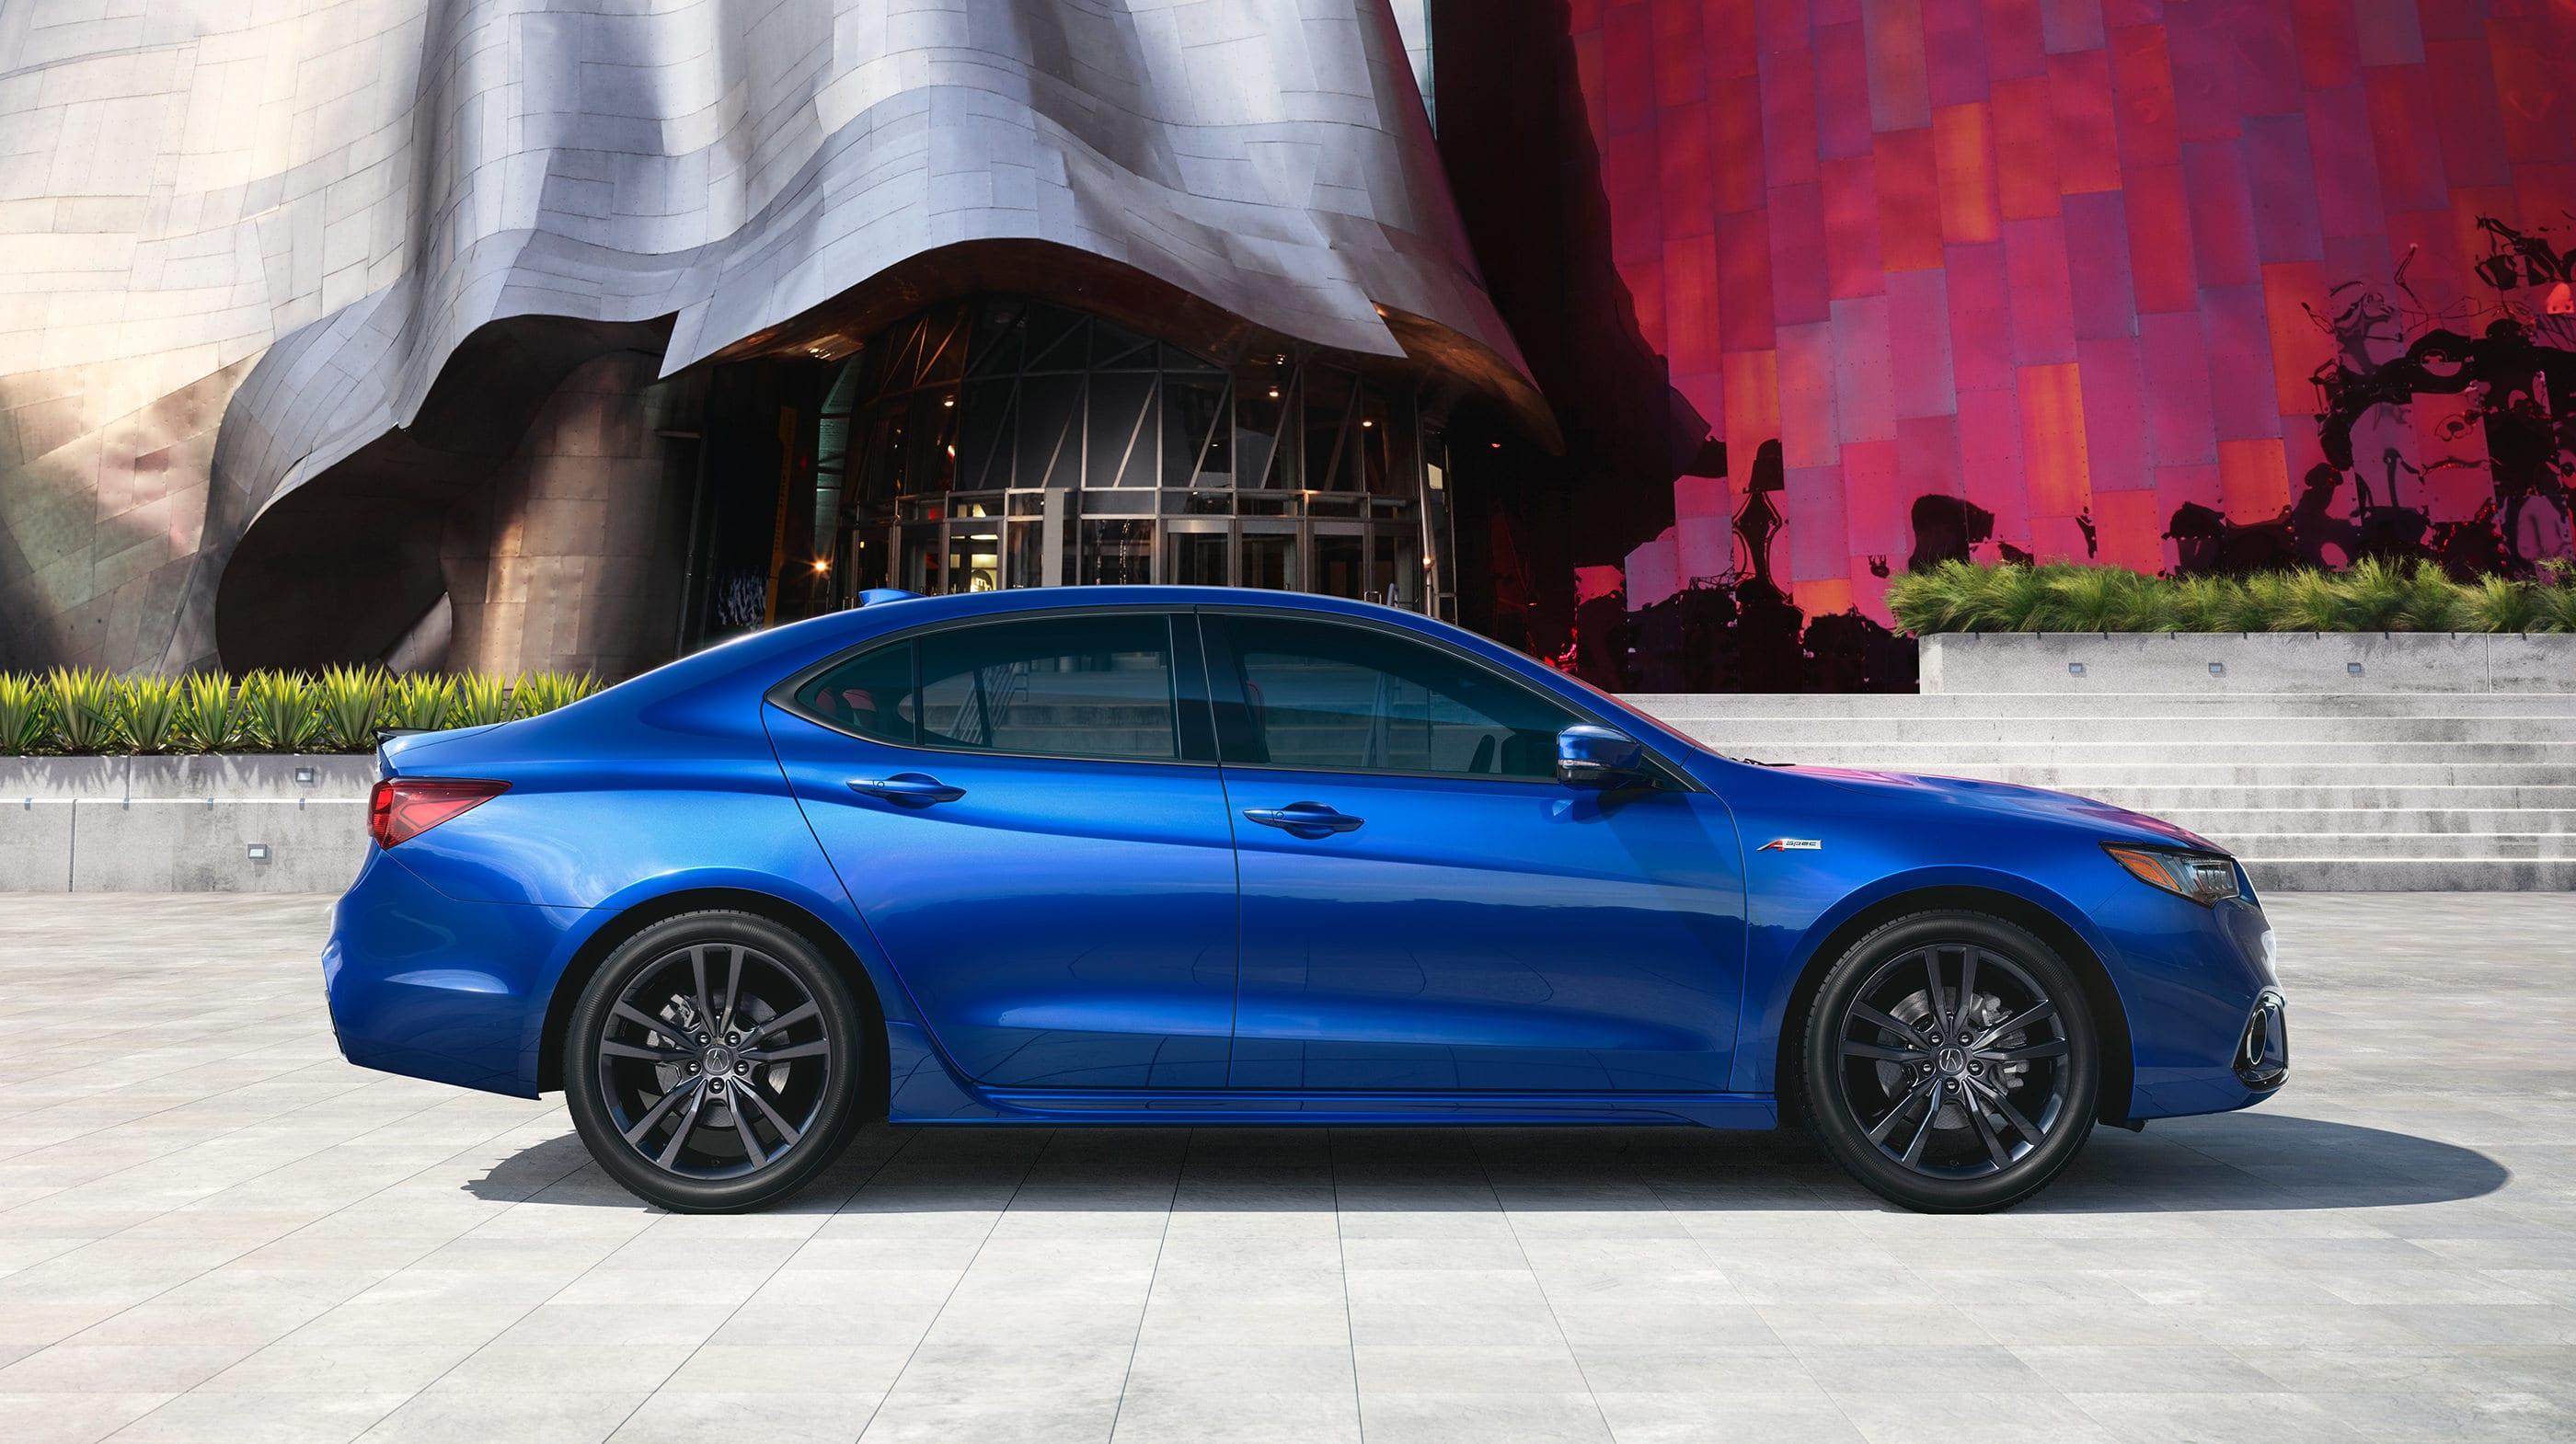 2020 Acura TLX Financing near Palatine, IL